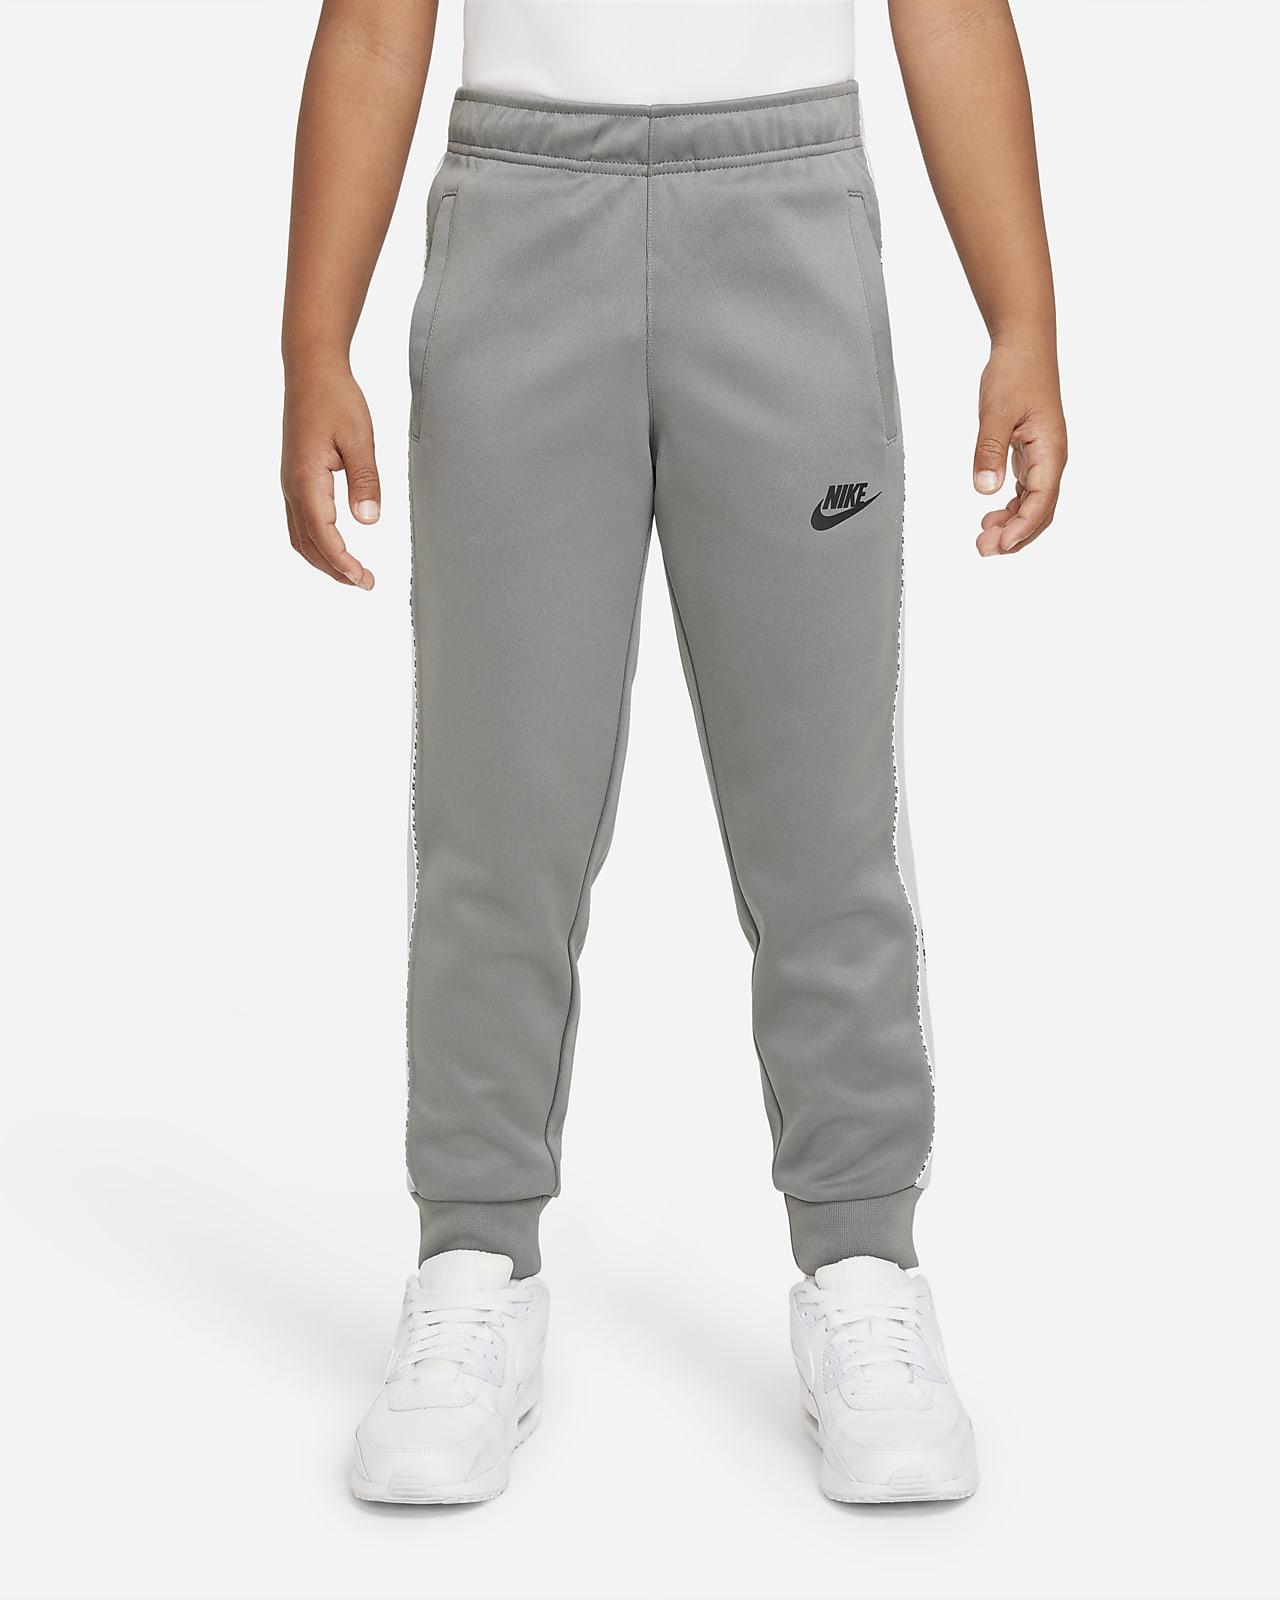 Nike Sportswear Genç Çocuk (Erkek) Jogger'ı